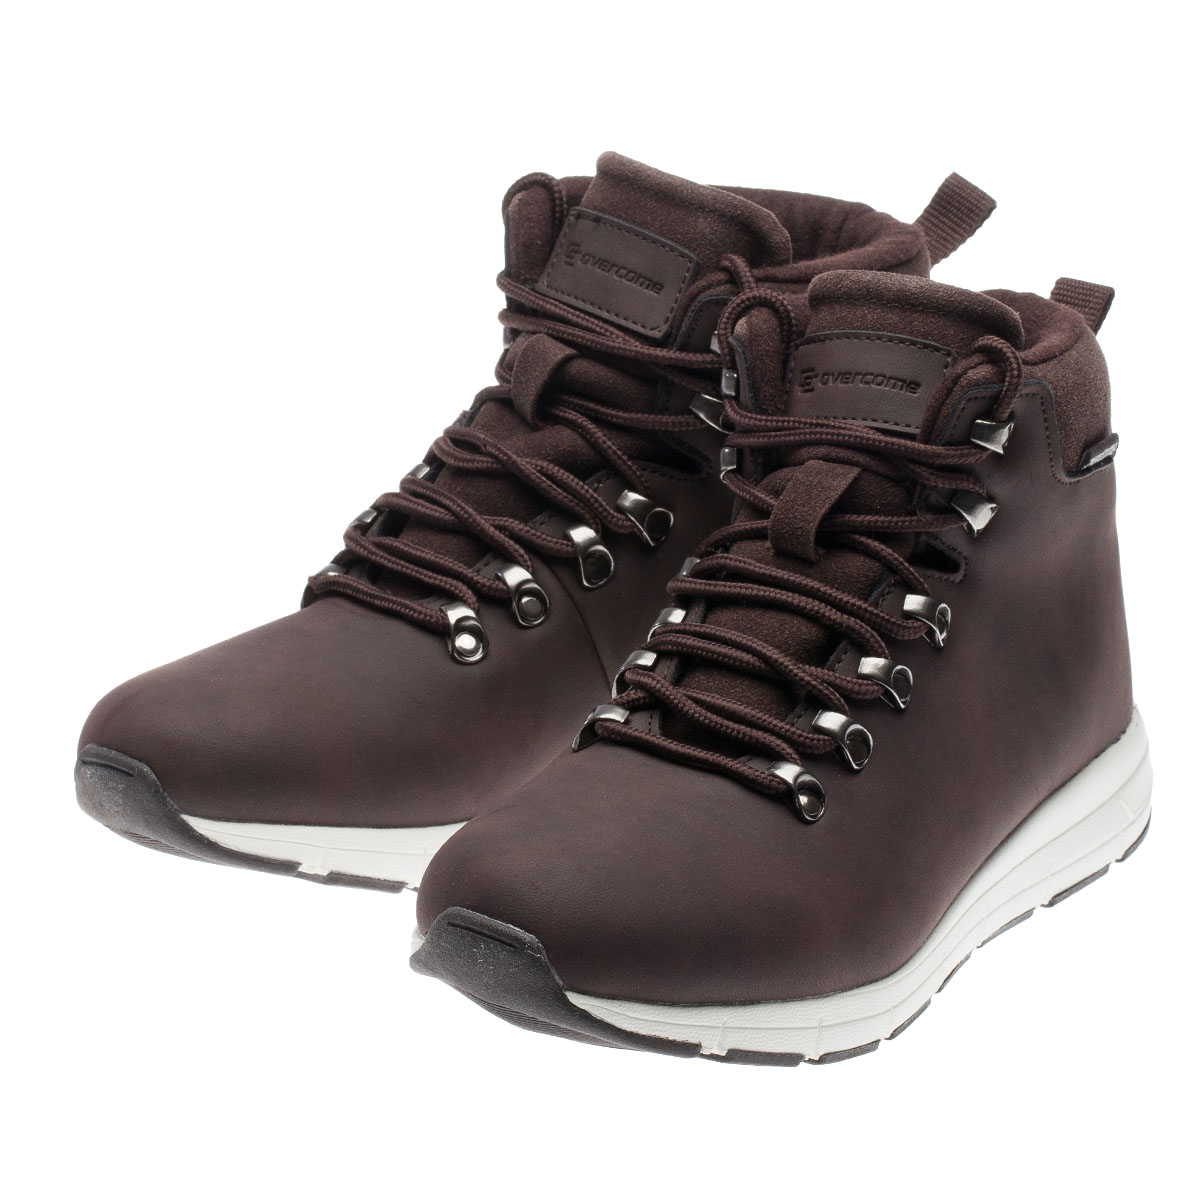 Ботинки демисезонные Overcome, LE65552-2 ботинки демисезонные overcome pfl 16821 2